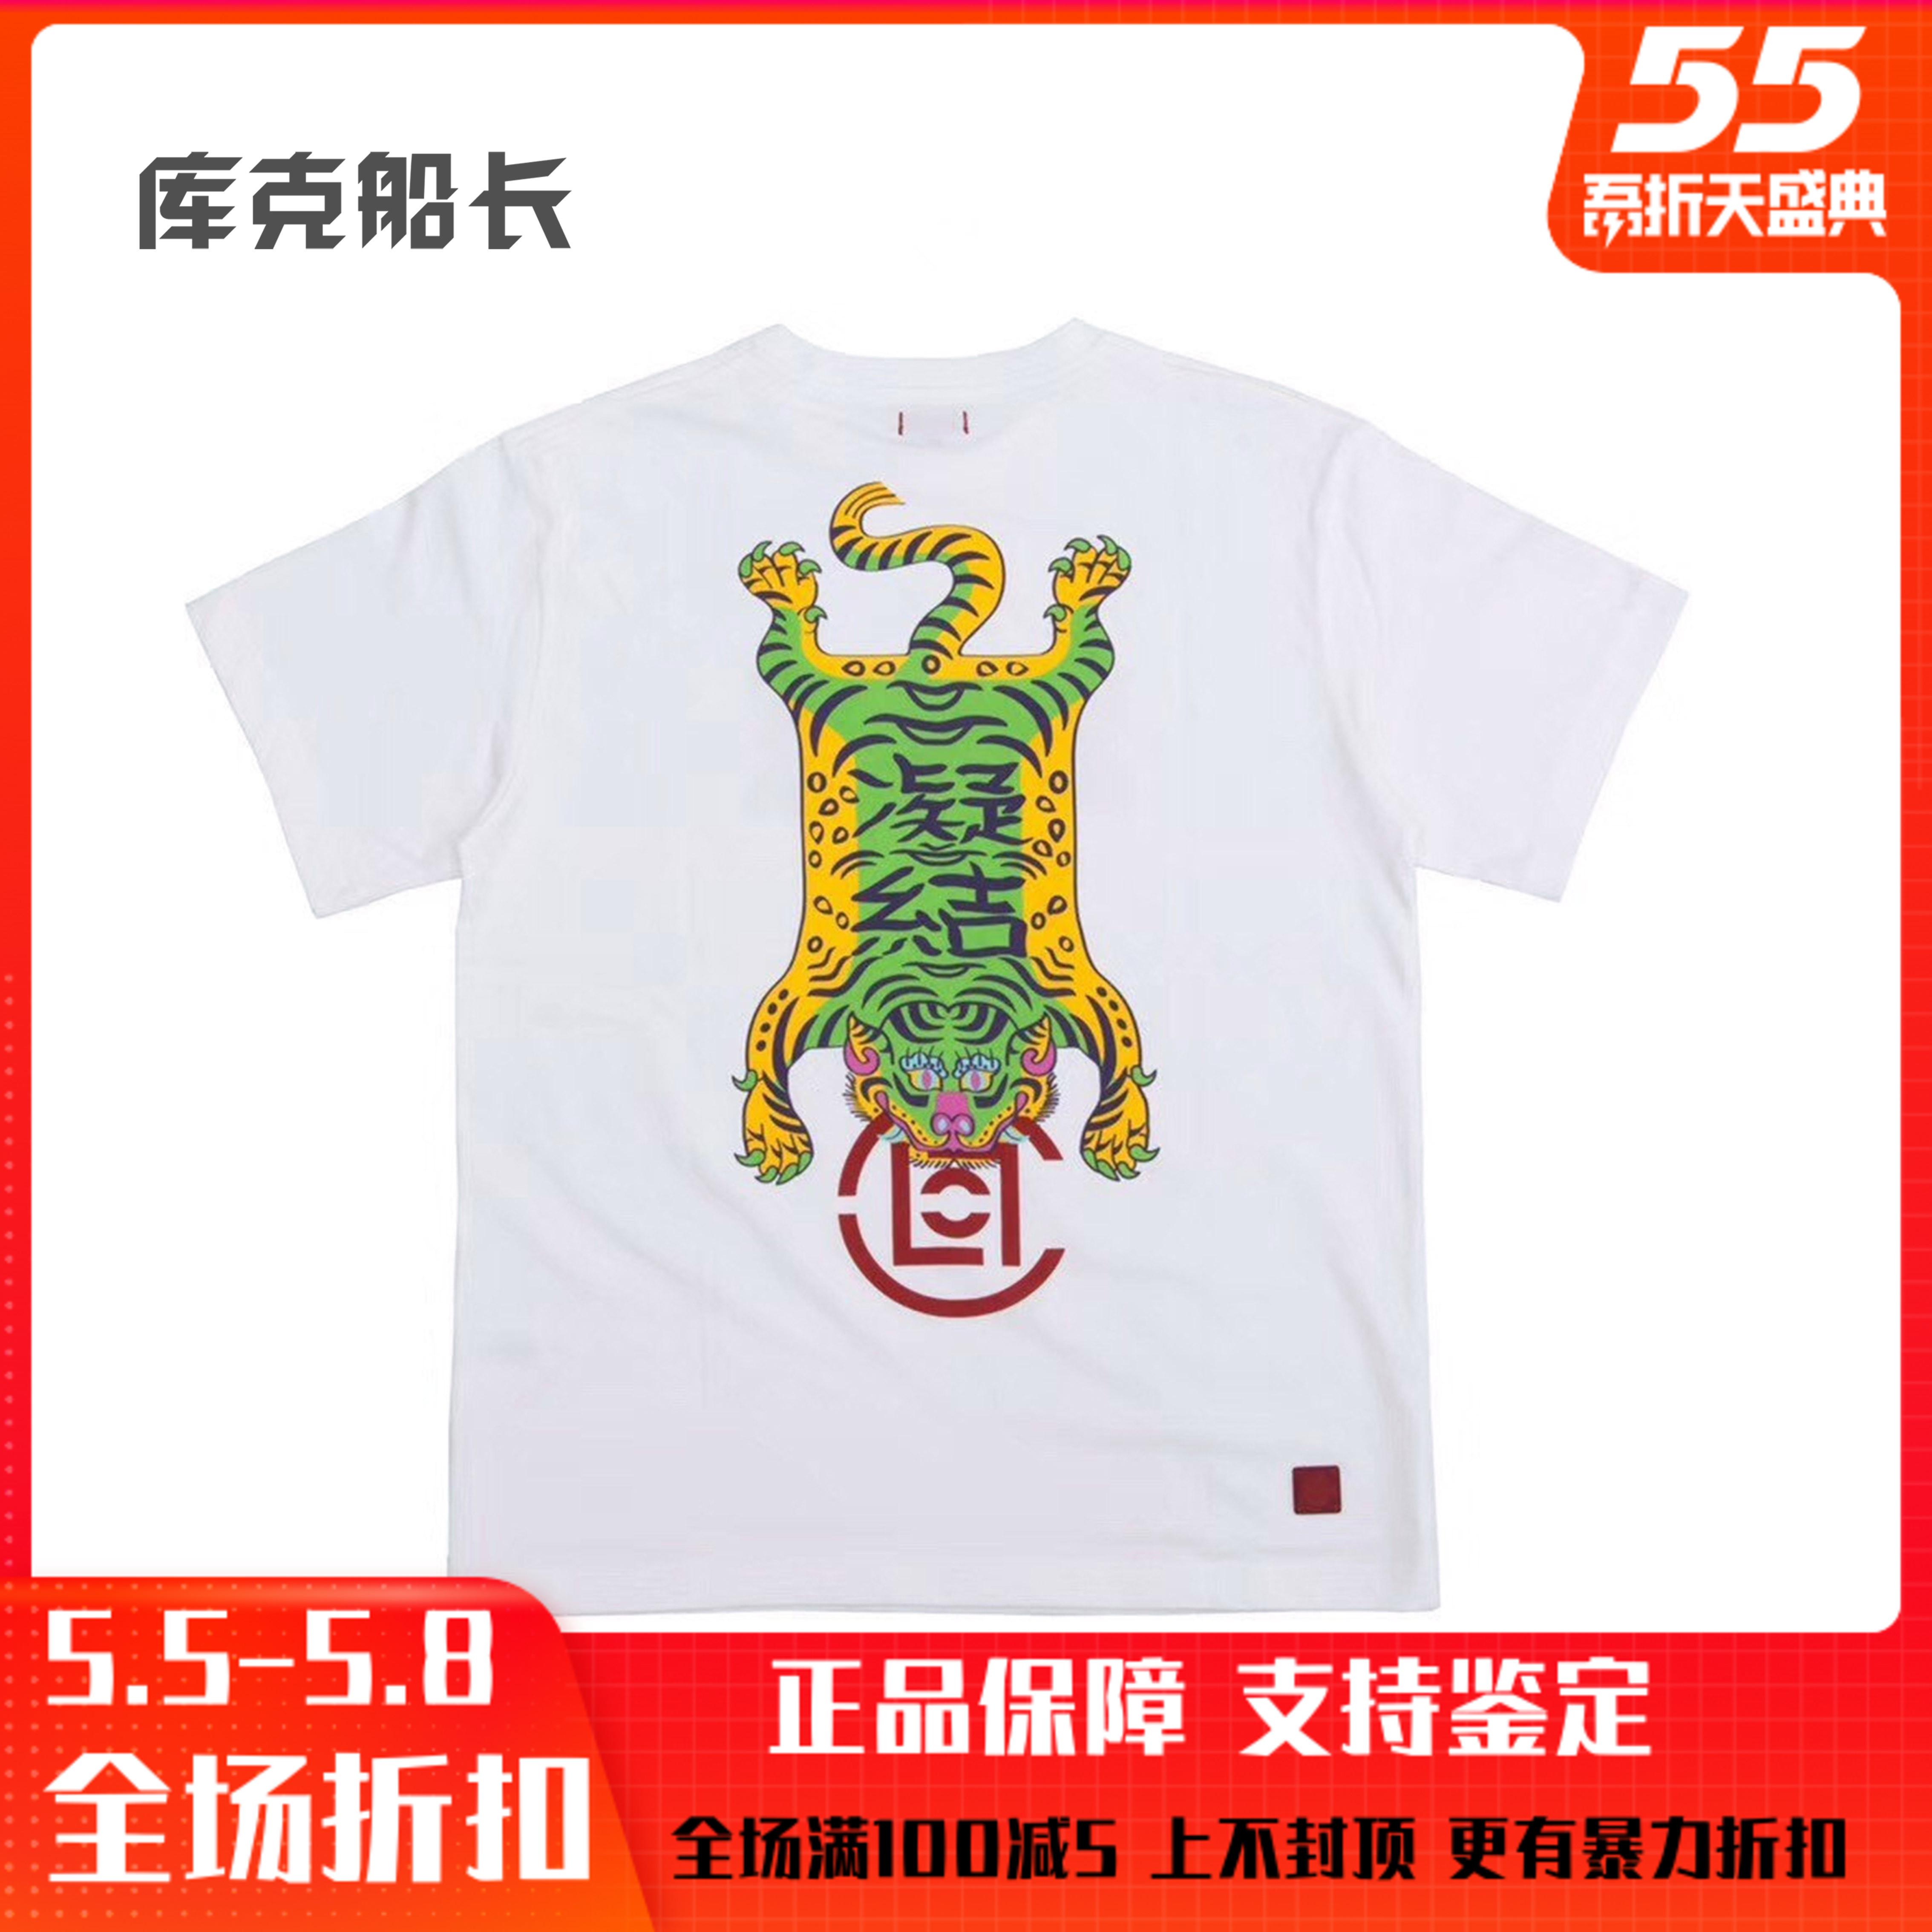 CLOT 華人Chinese 老虎短袖T 陳冠希同款 凝結集團 巴黎時裝同款